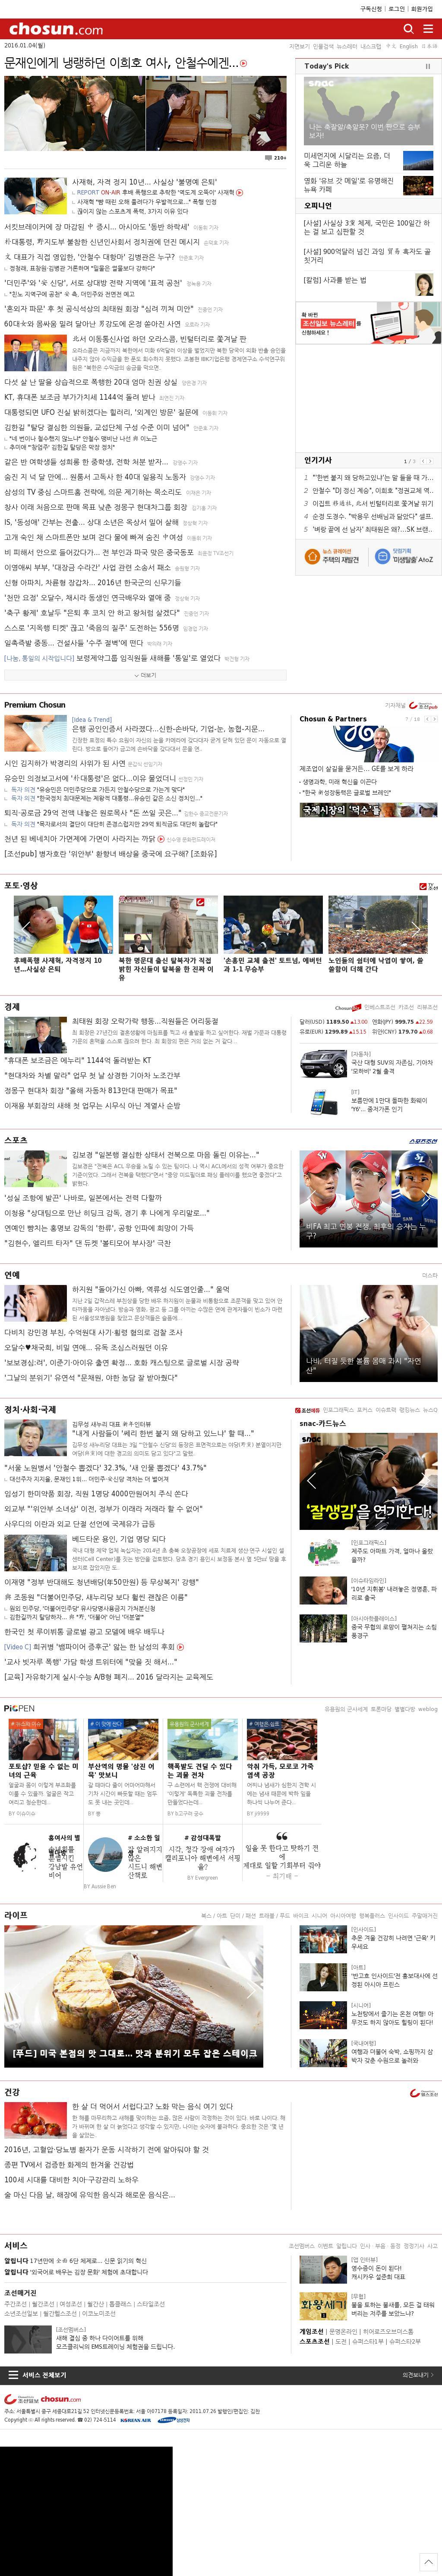 chosun.com at Monday Jan. 4, 2016, 11:03 a.m. UTC